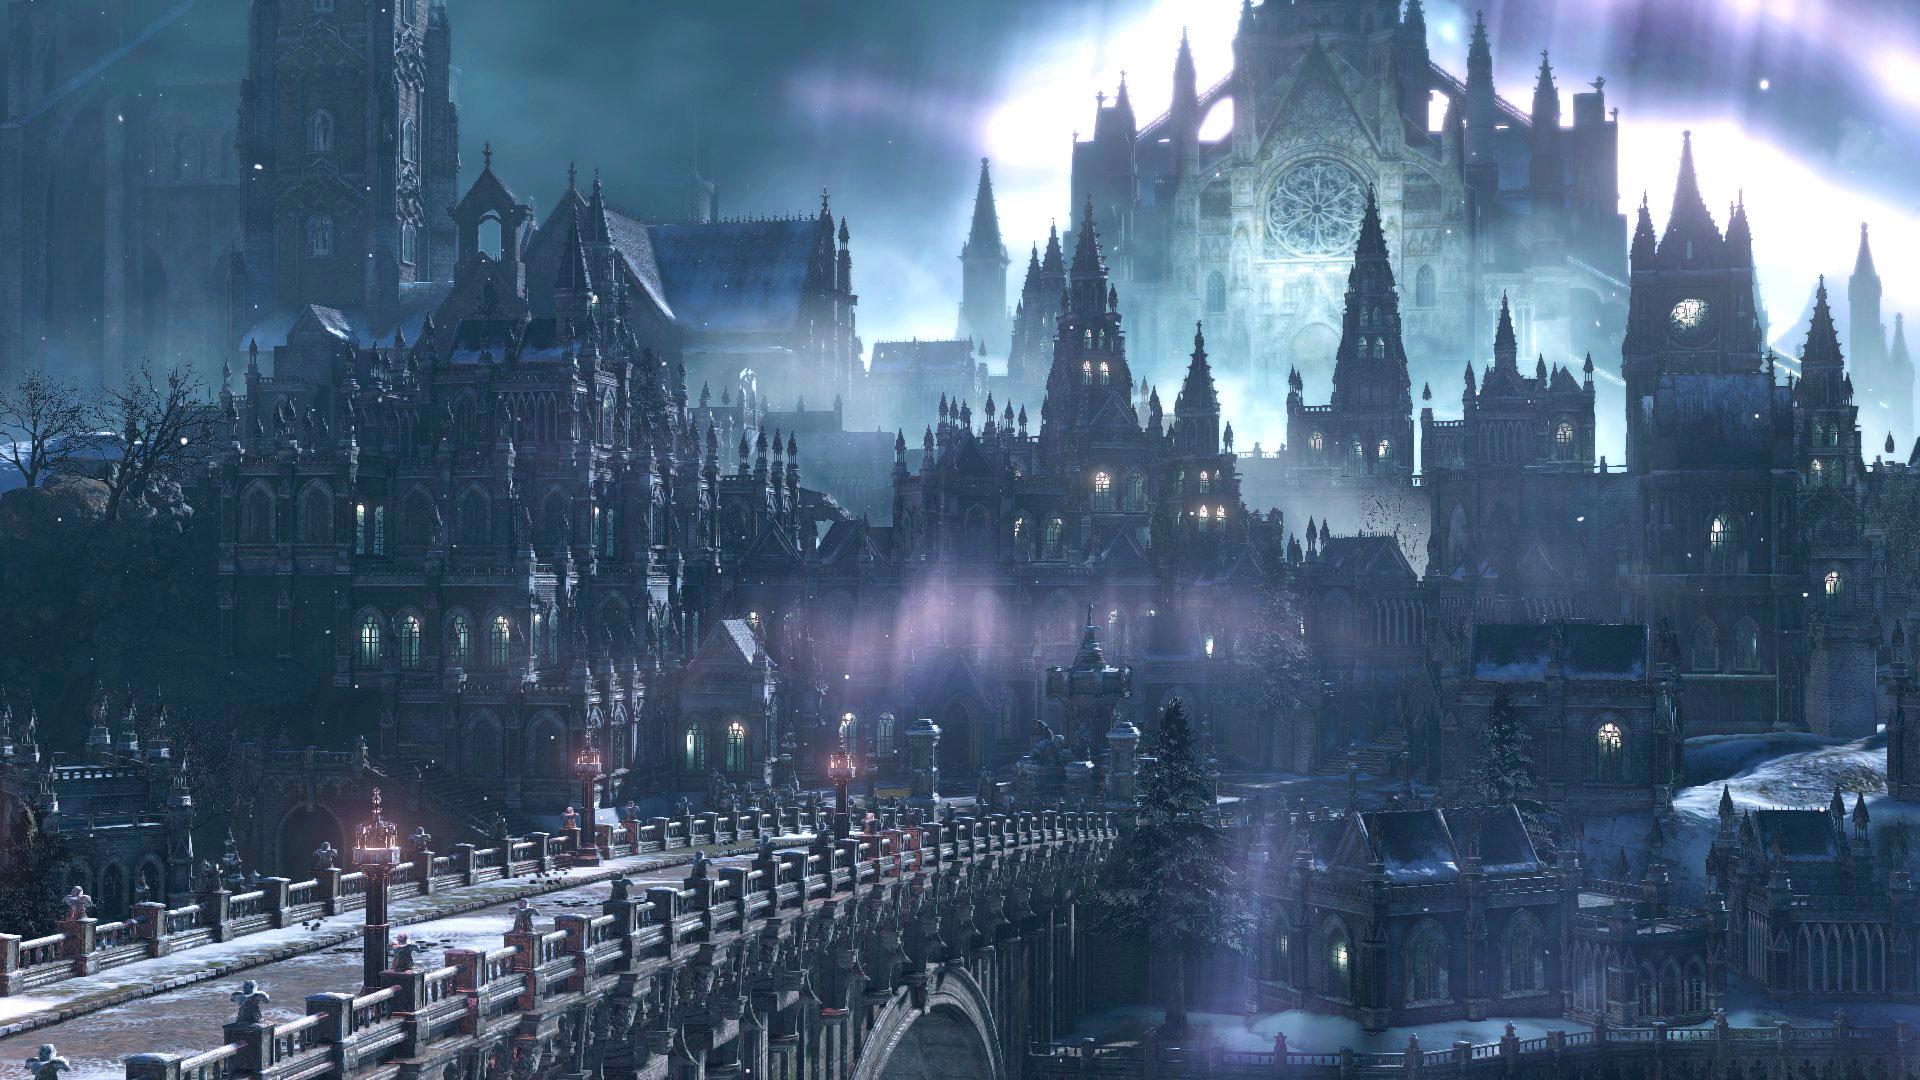 Dark Souls 3 Wallpaper 1080p: Dark Souls 3 Wallpapers 1920x1080 Full HD (1080p) Desktop